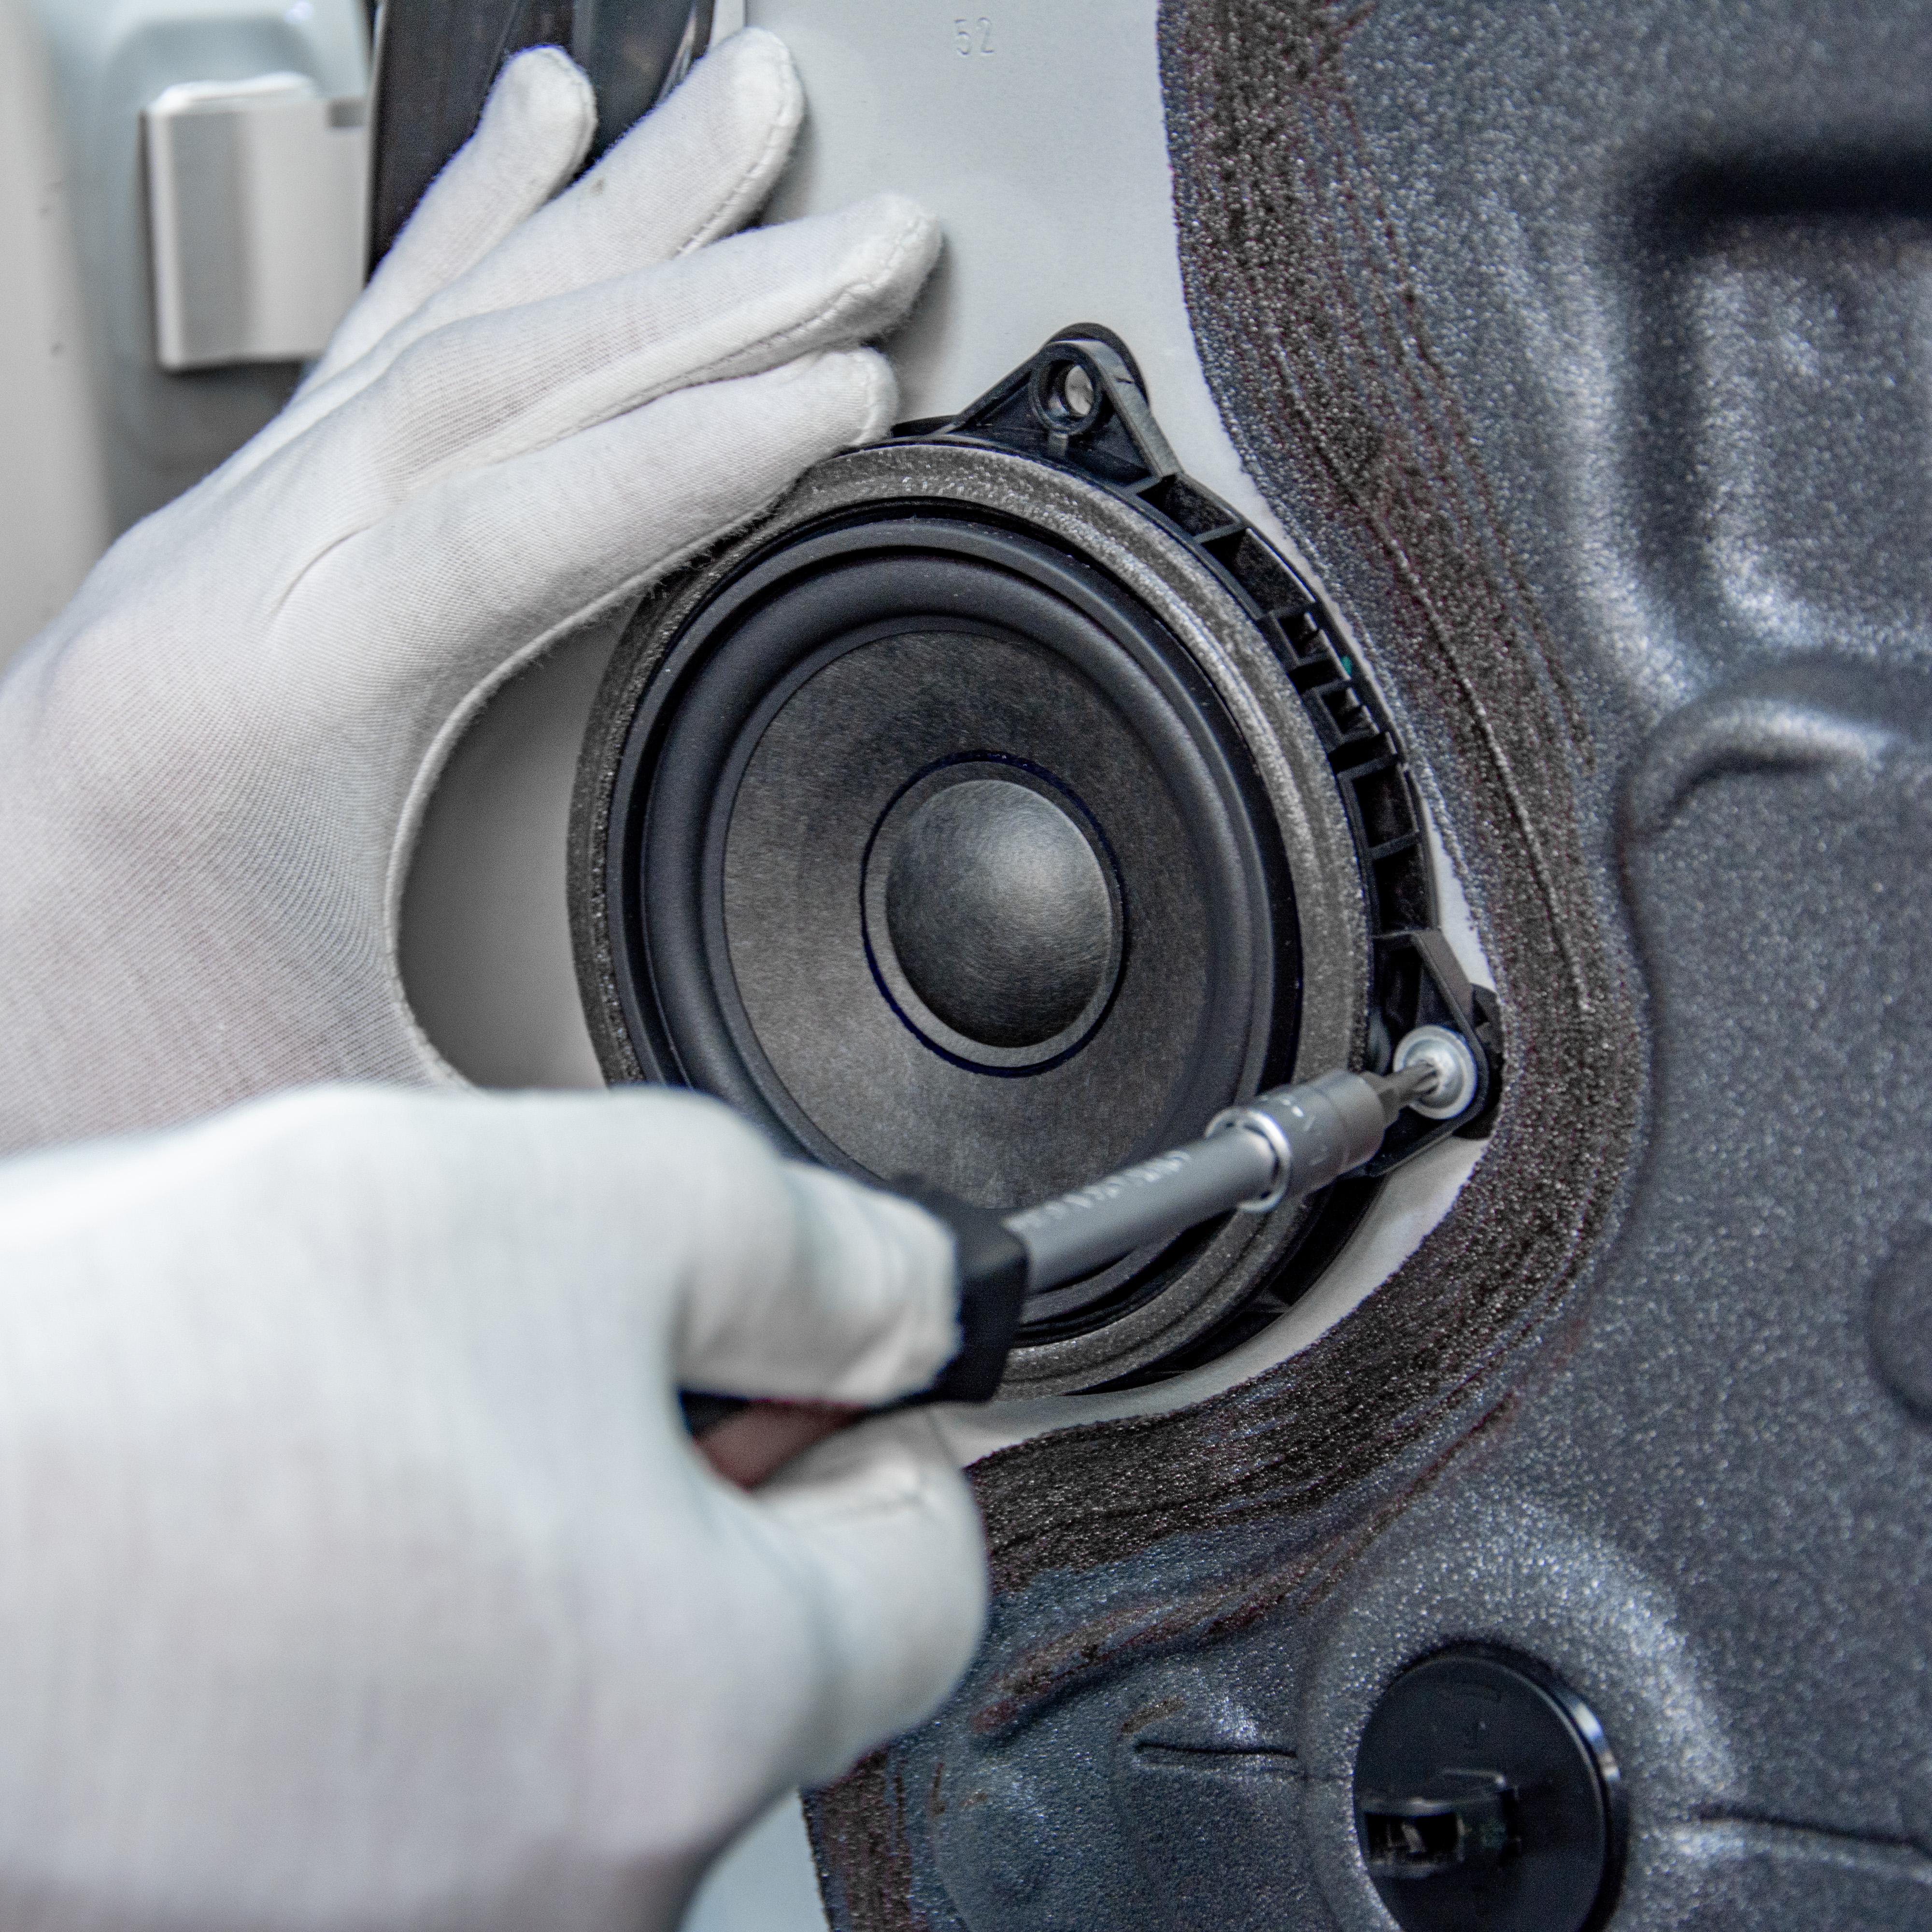 Prémiový audio systém do BMW, Mercedesů a dalších prémiových vozů.